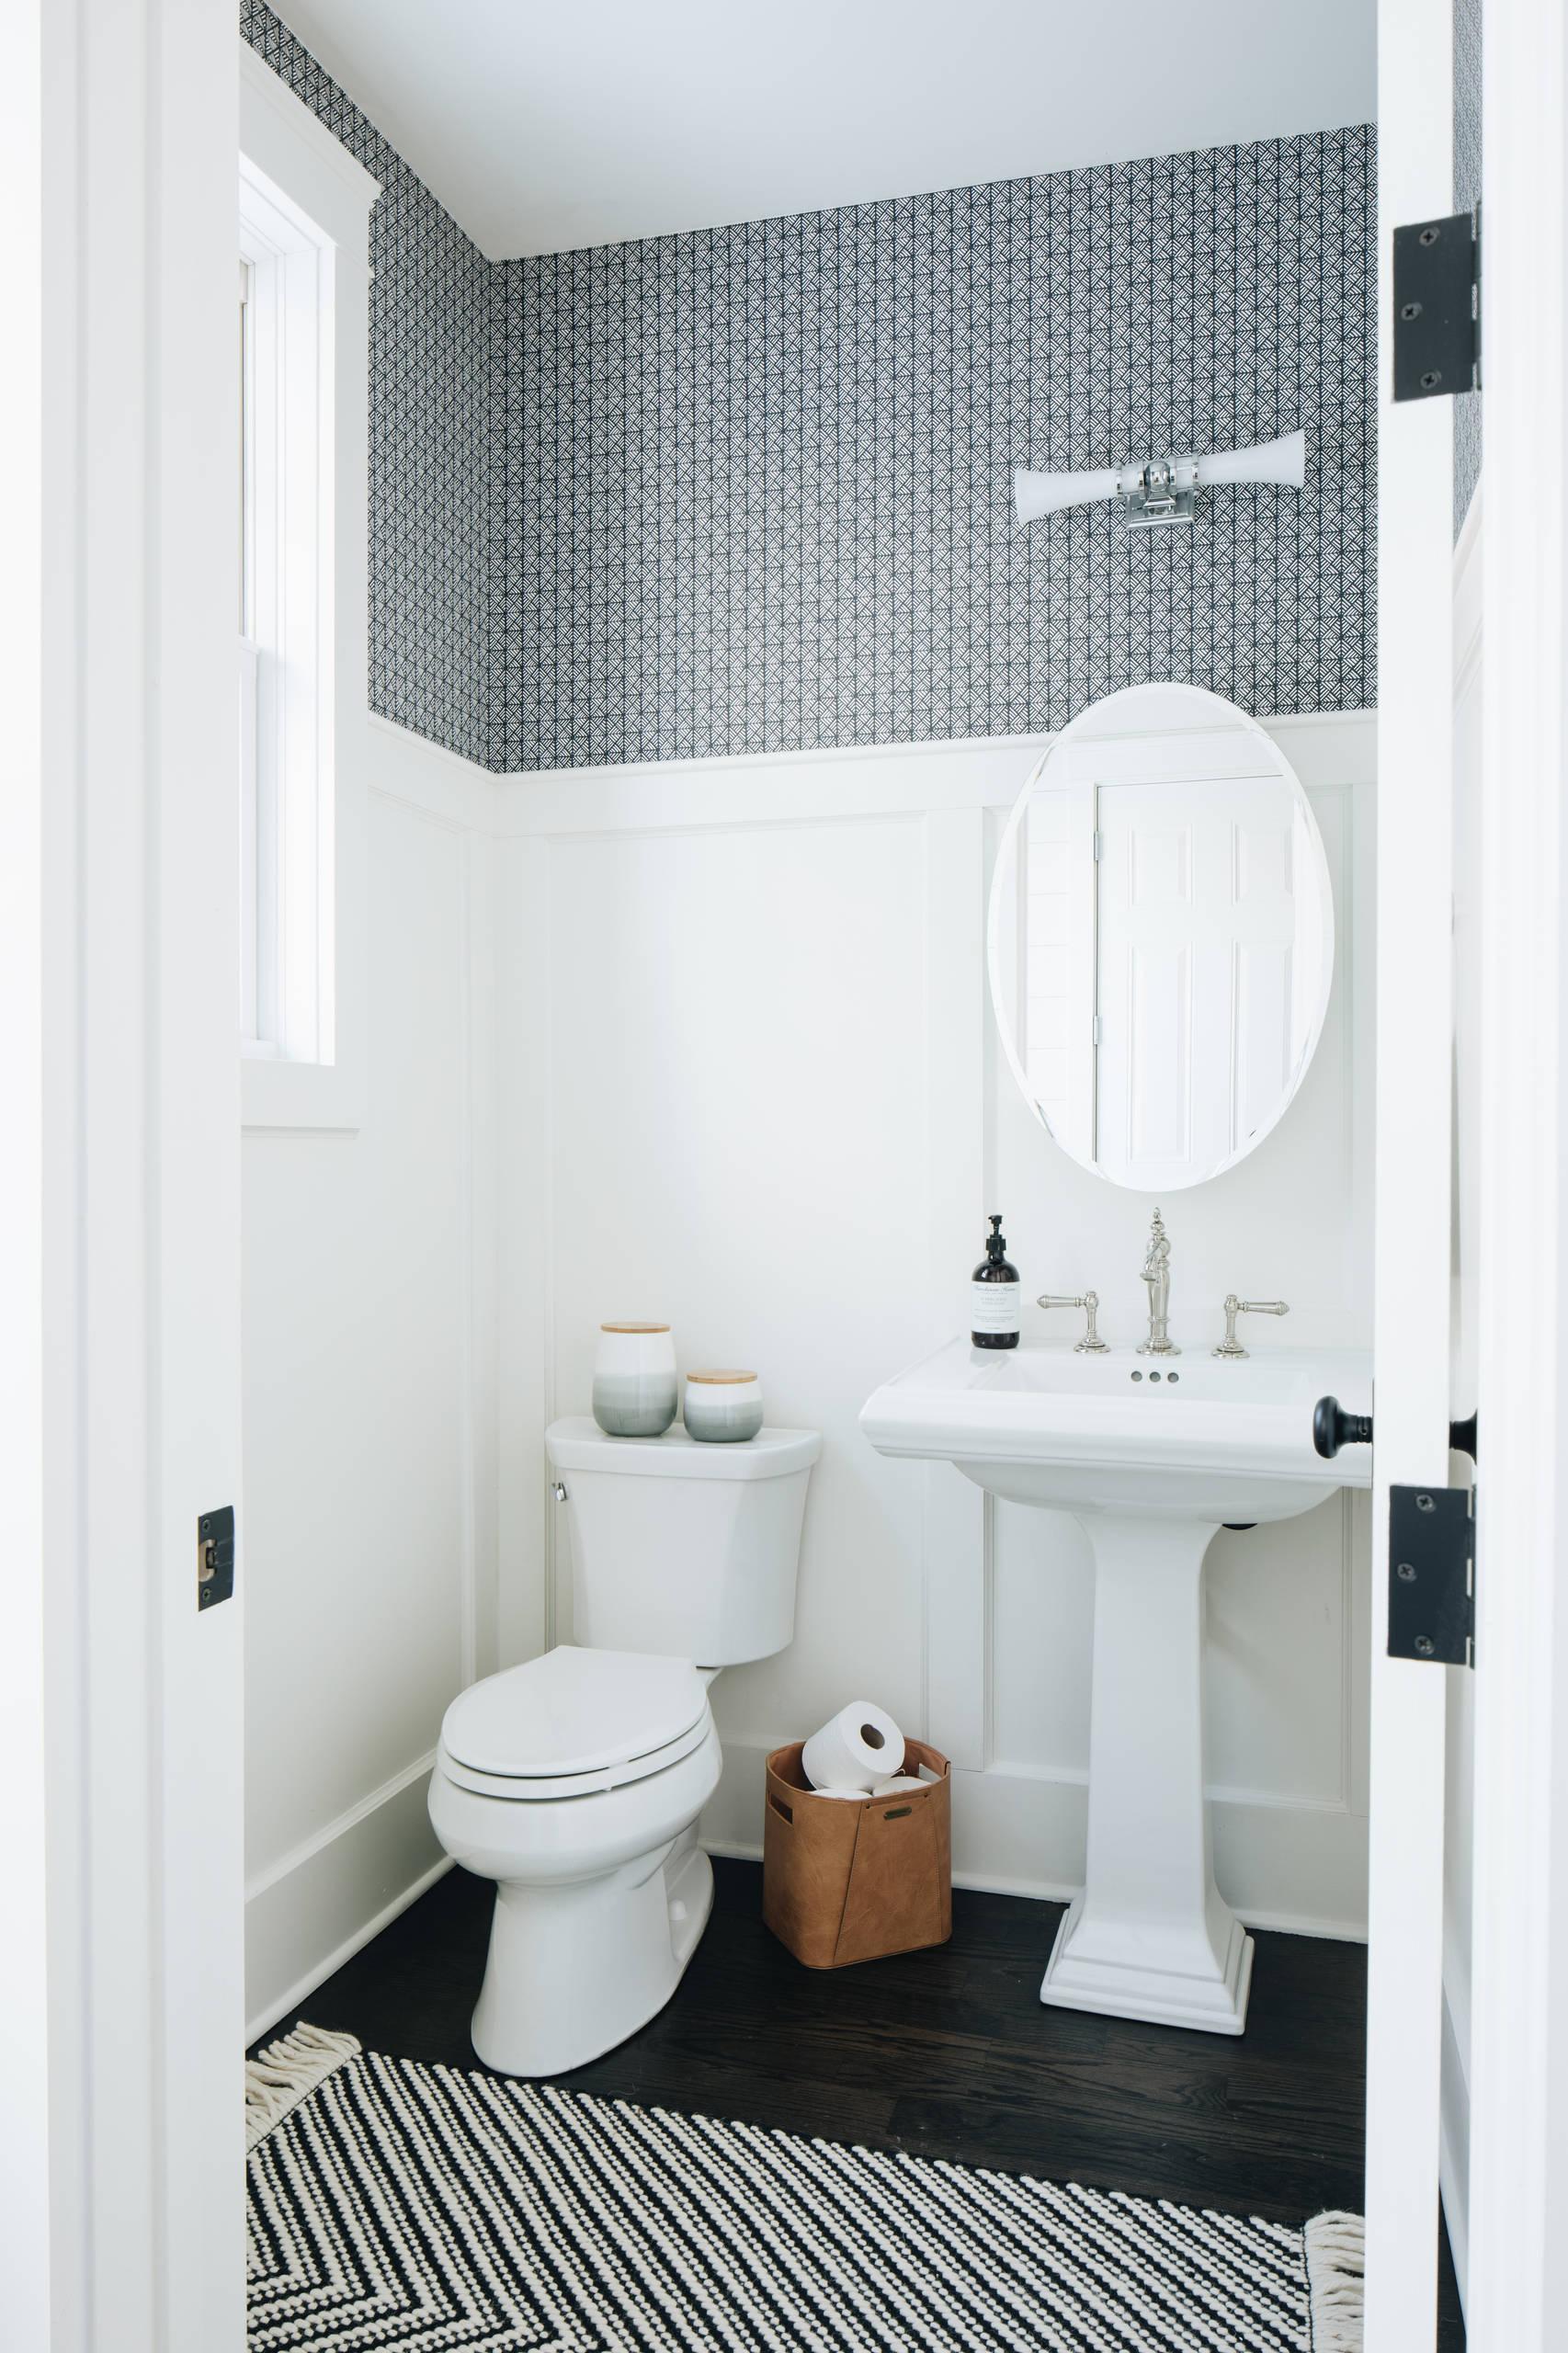 75 Beautiful Farmhouse White Powder Room Pictures Ideas February 2021 Houzz